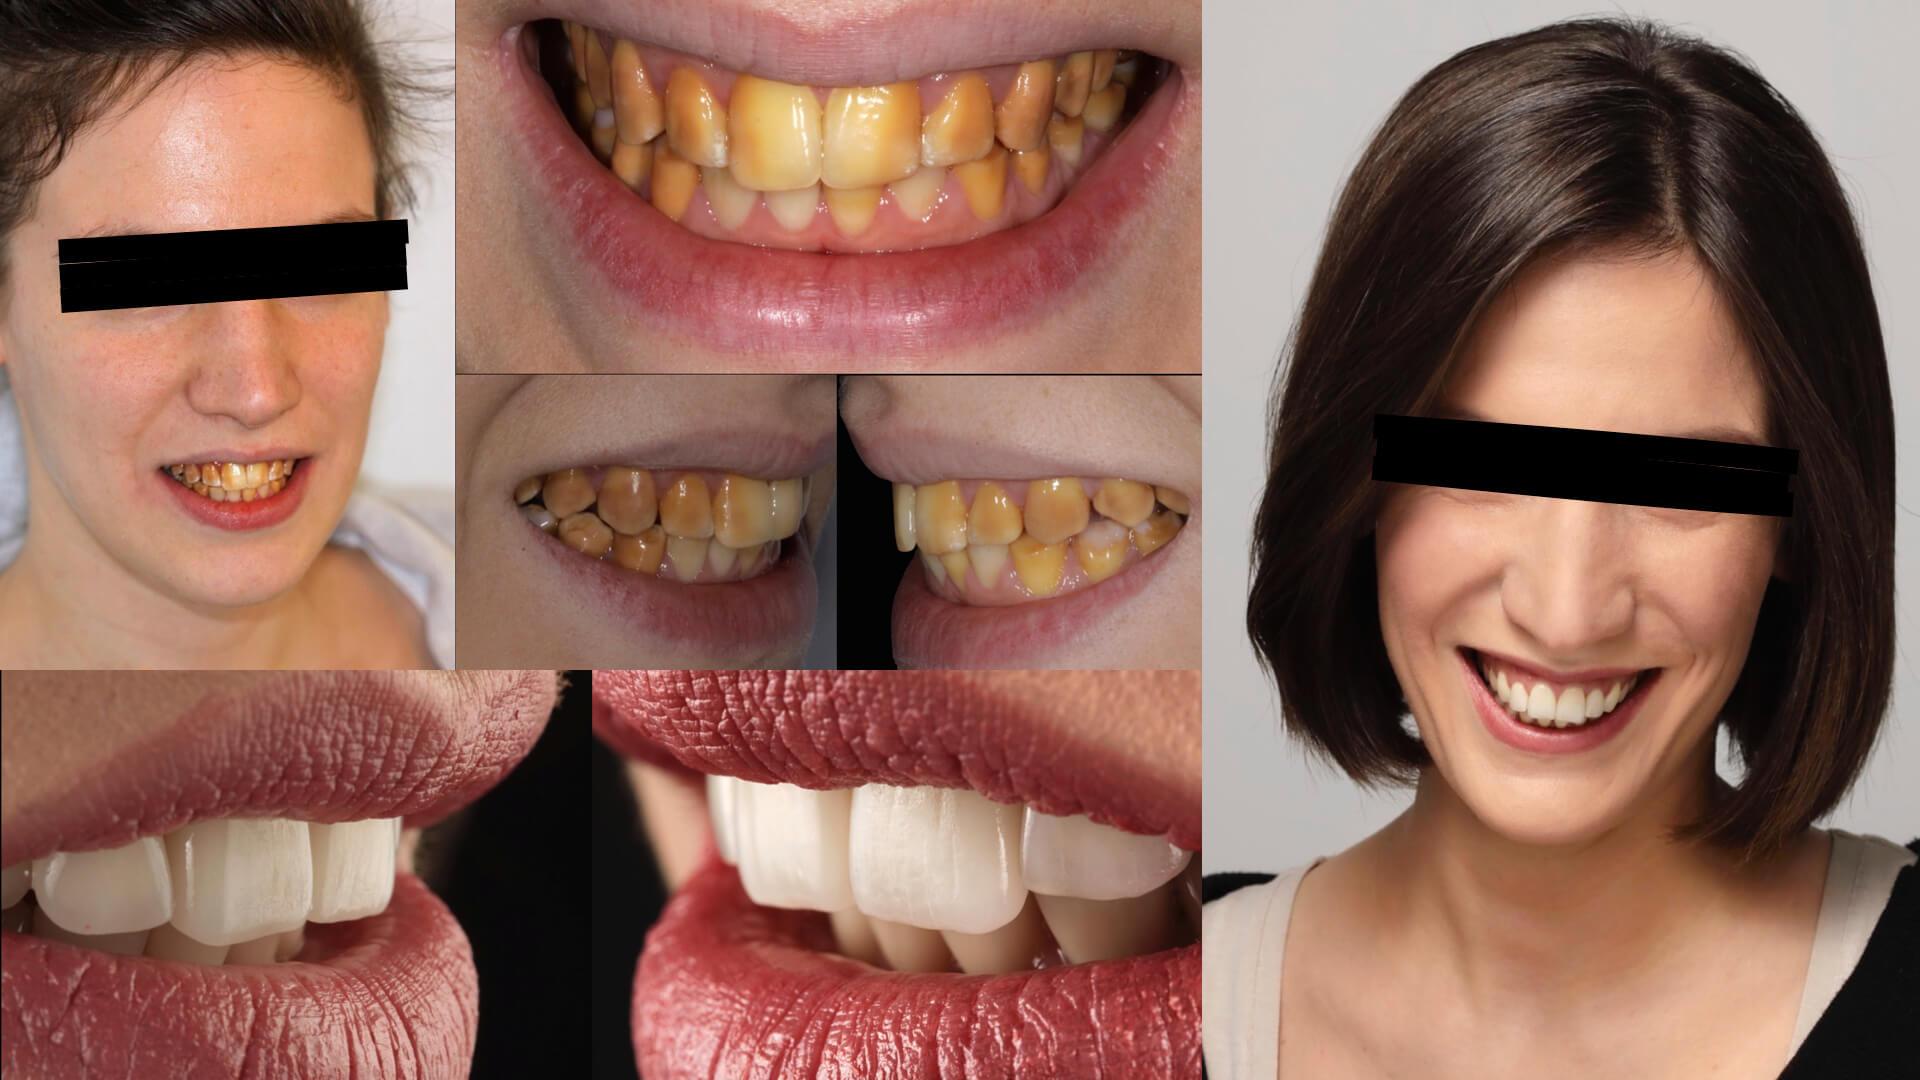 Prosthetic restoration in aesthetic Dentistry: winner case n°1 from Aiop International Prosthodontic Contest 2014